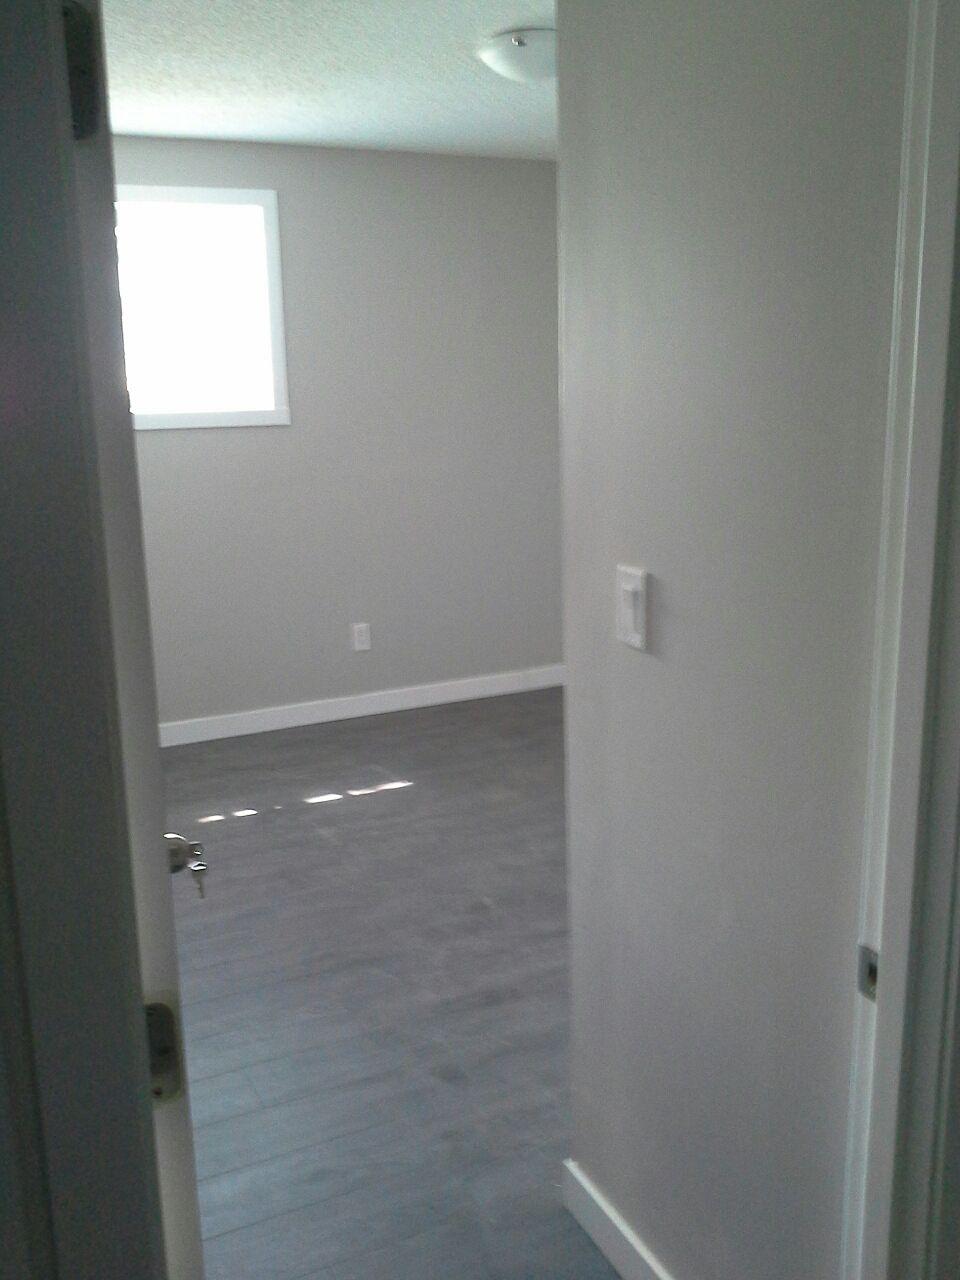 Calgary Basement For Rent Dalhousie Only Brand New Wiring Reno Lrt Nw